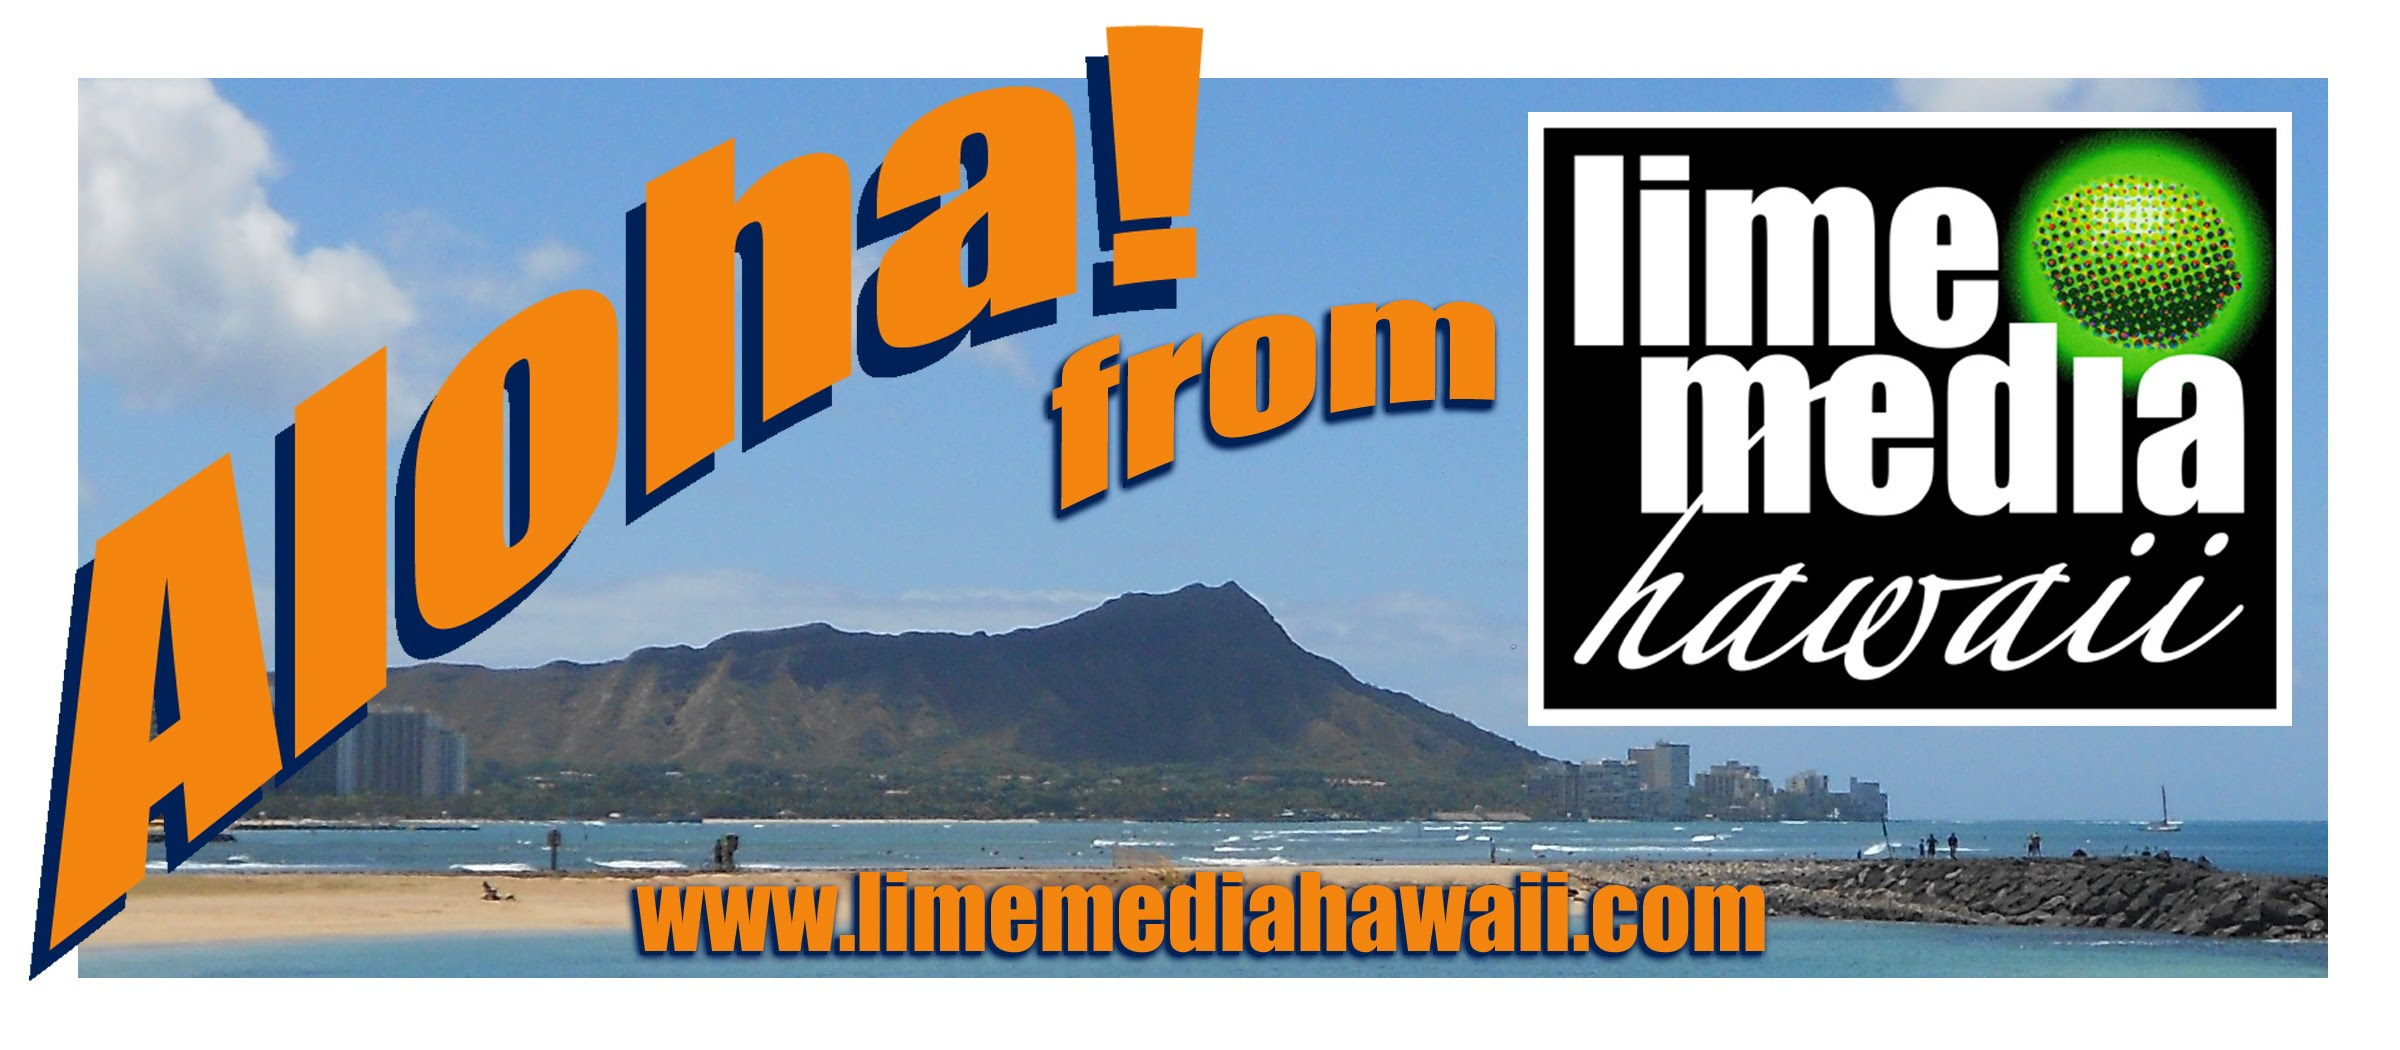 http://www.limemediahawaii.com/lmh-business